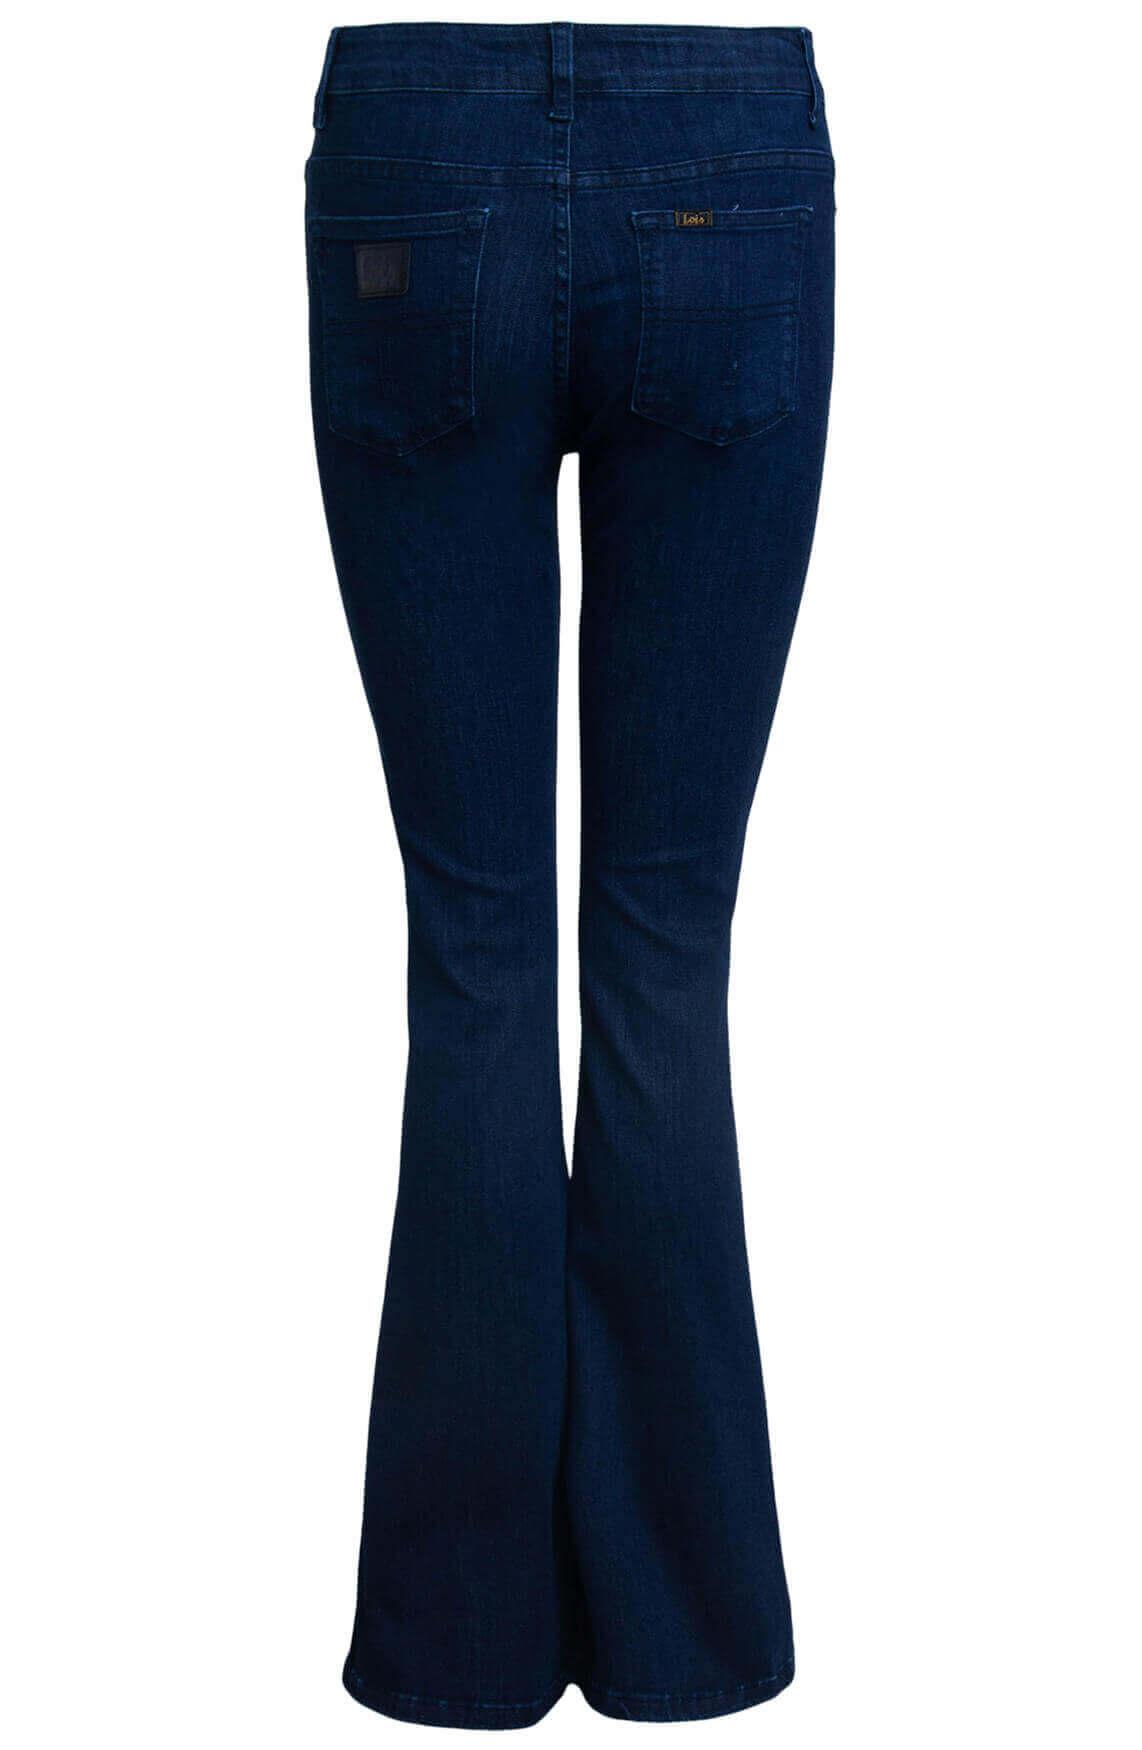 Lois Dames L34 Raval leia jeans Blauw